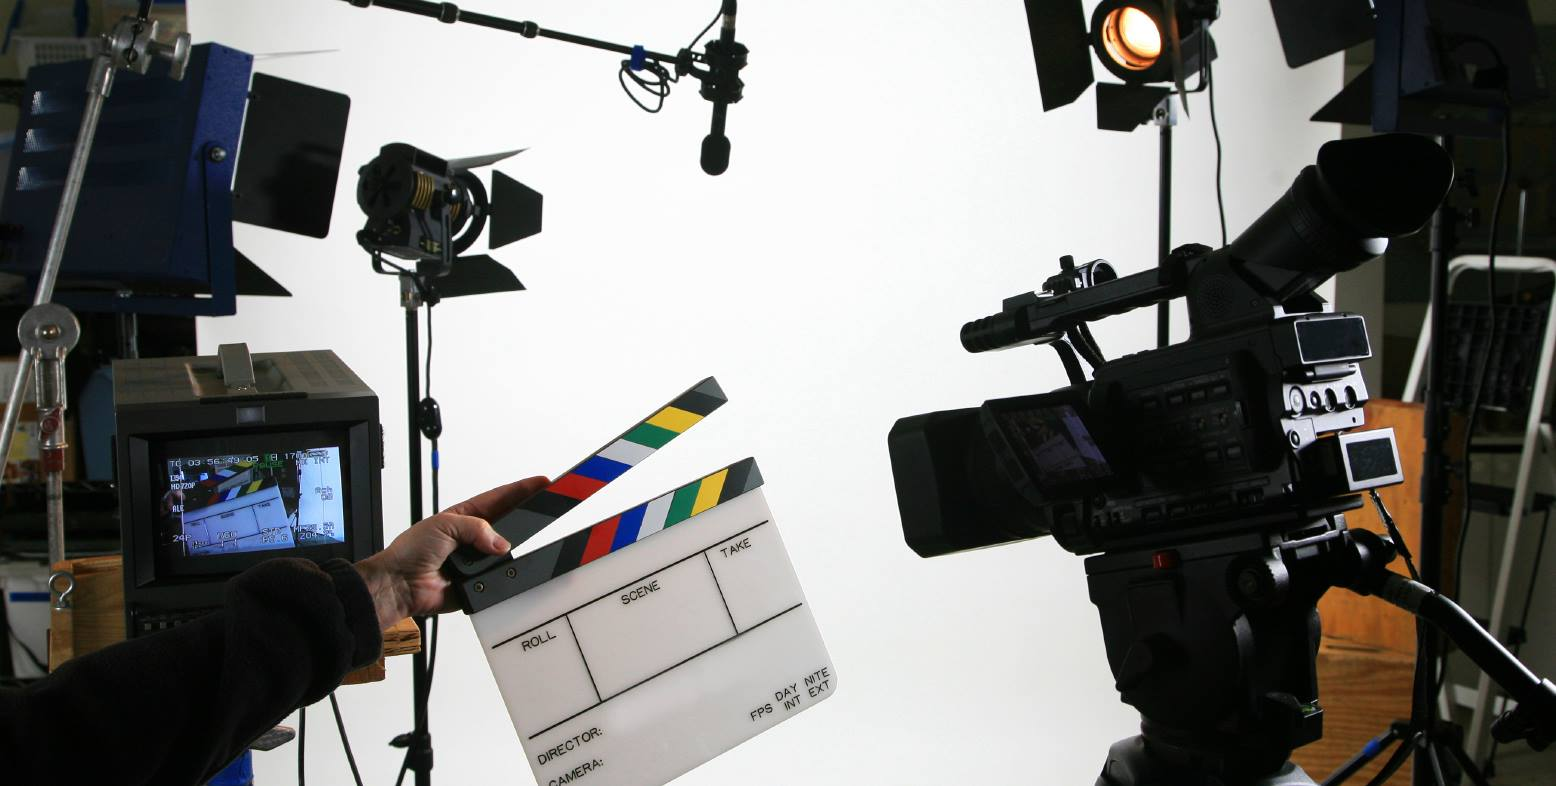 Kaliteli Reklam Filmleri